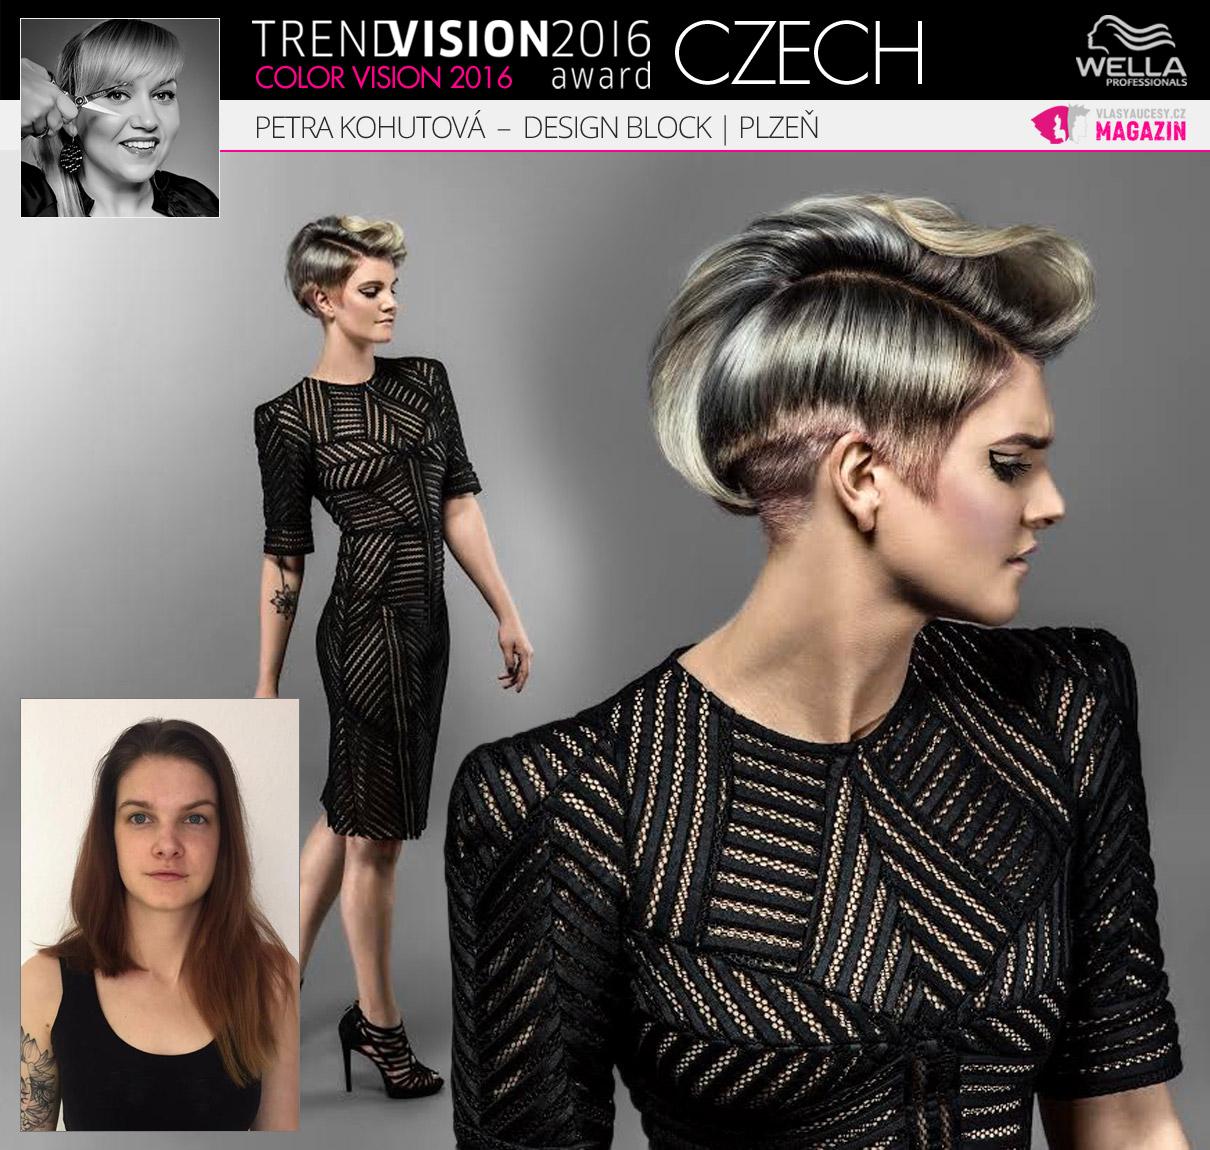 Petra Kohutová, Design Block, Plzeň –Wella Professionals Trend Vision Award Česká republika, kategorie Color Vision 2016.